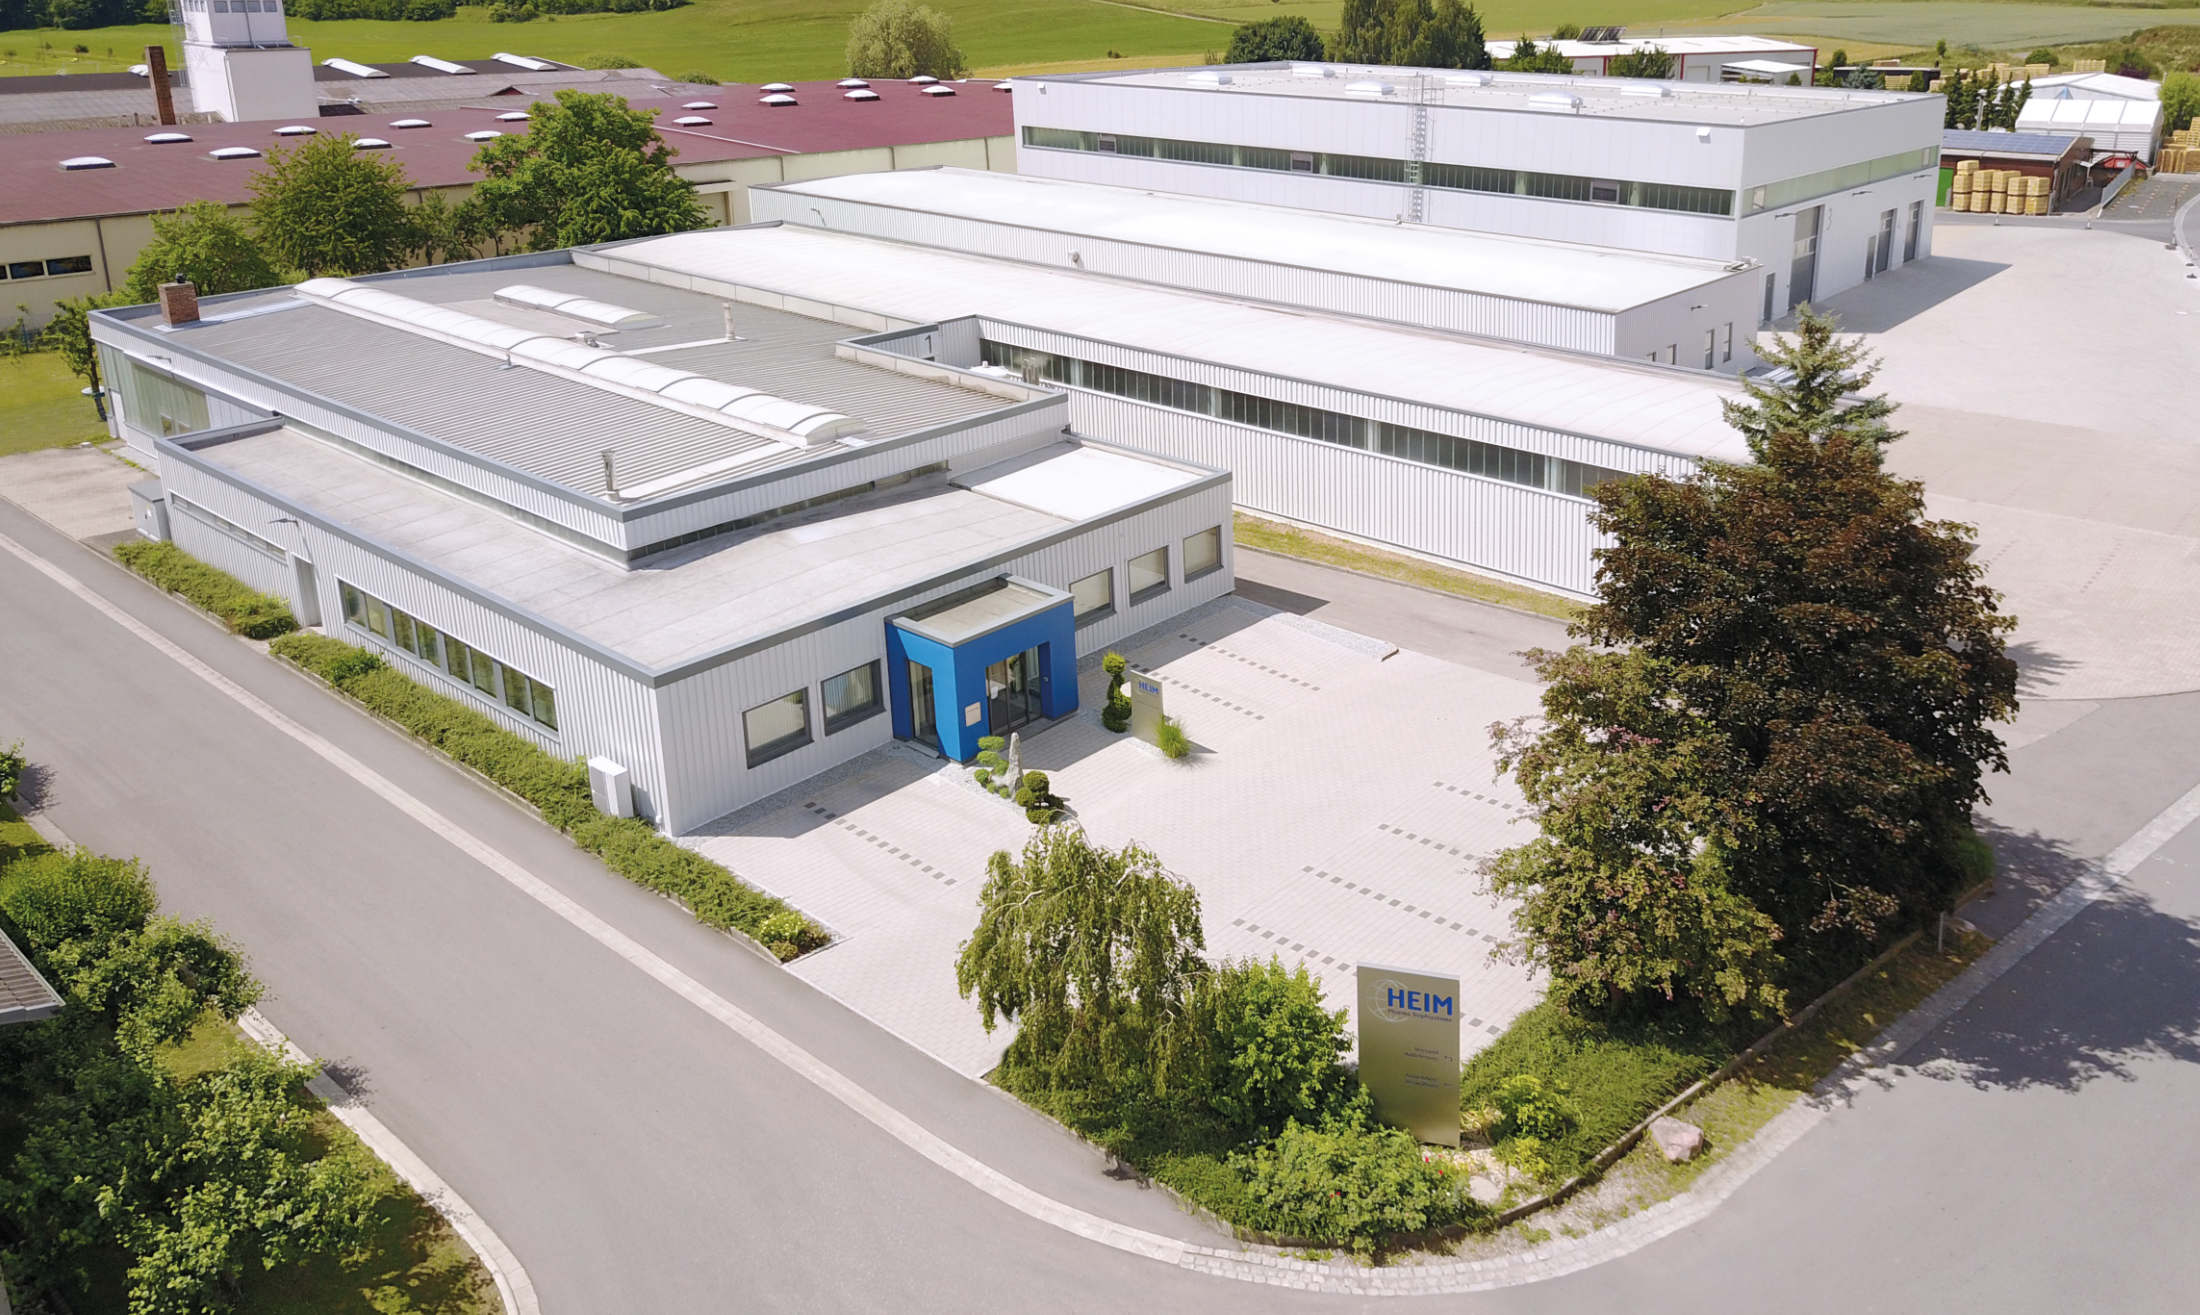 HEIM Pharma company buildings